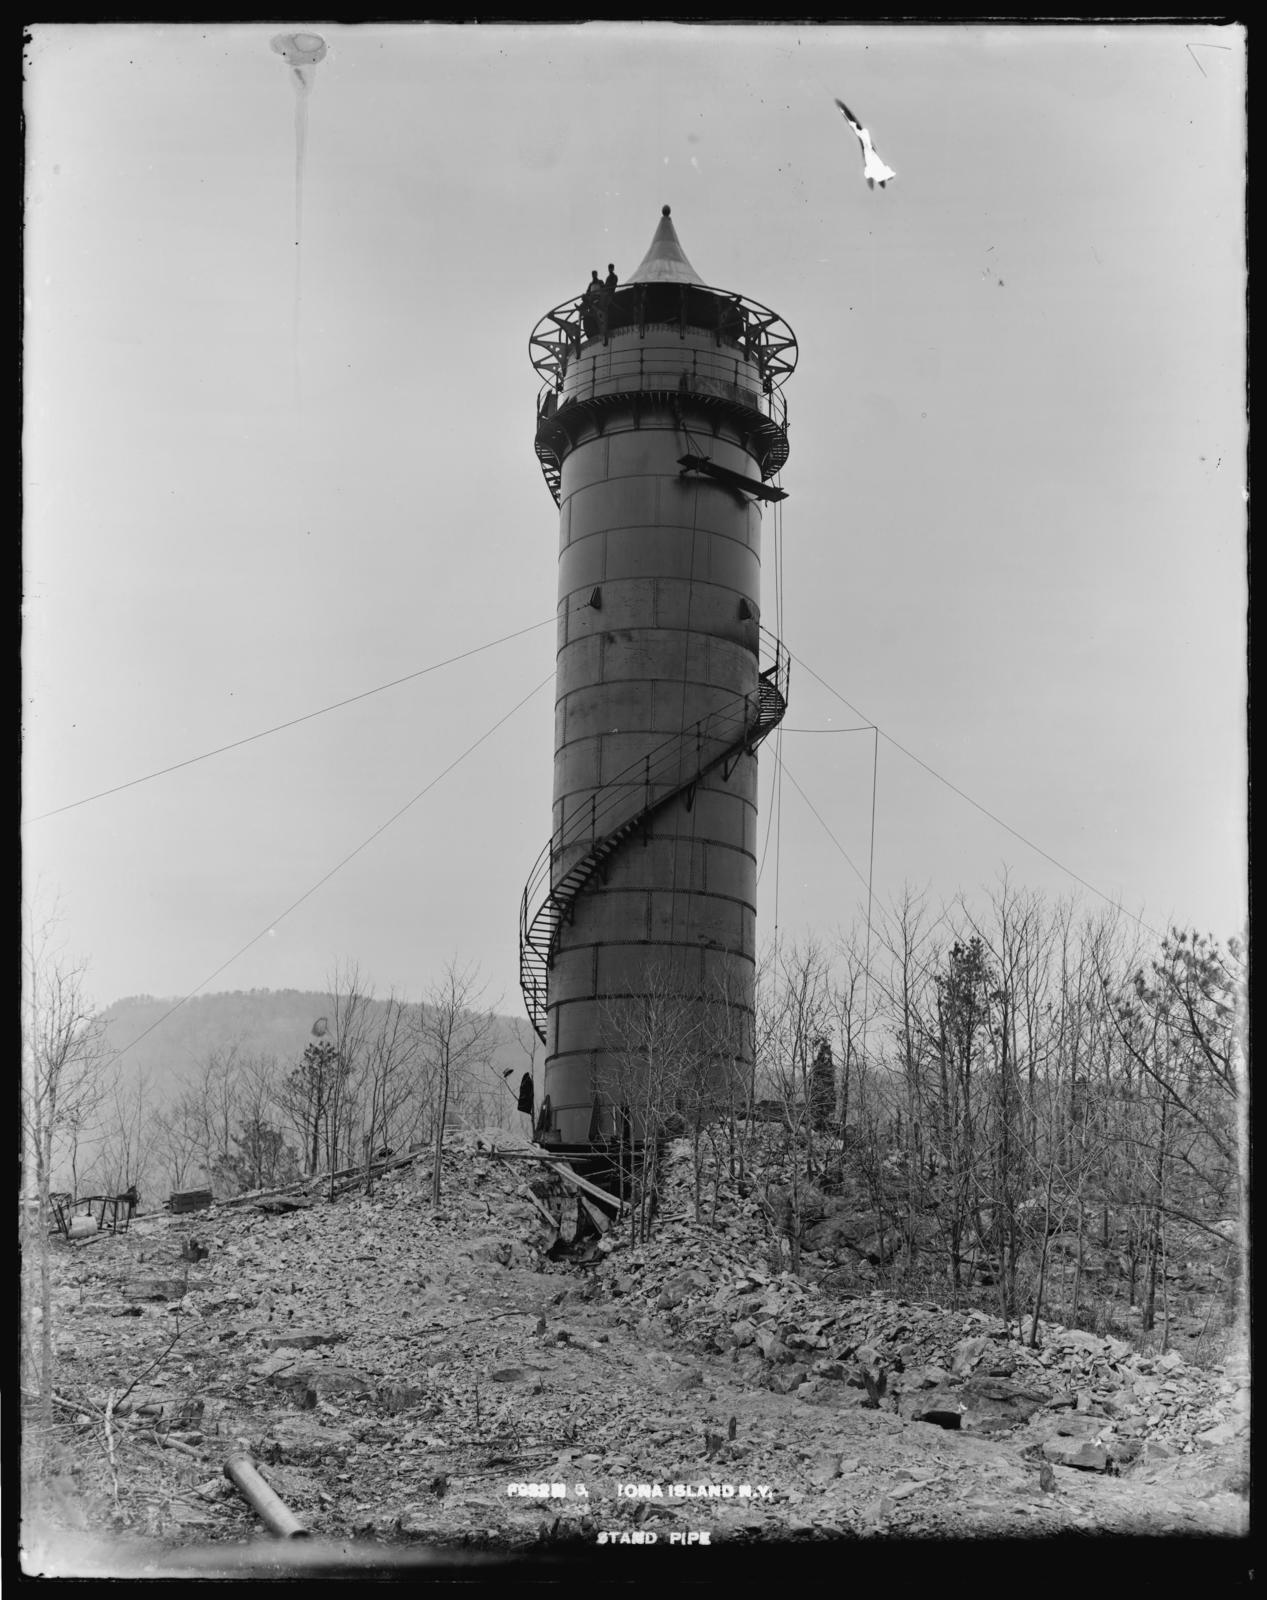 Iona Island, New York, Stand Pipe